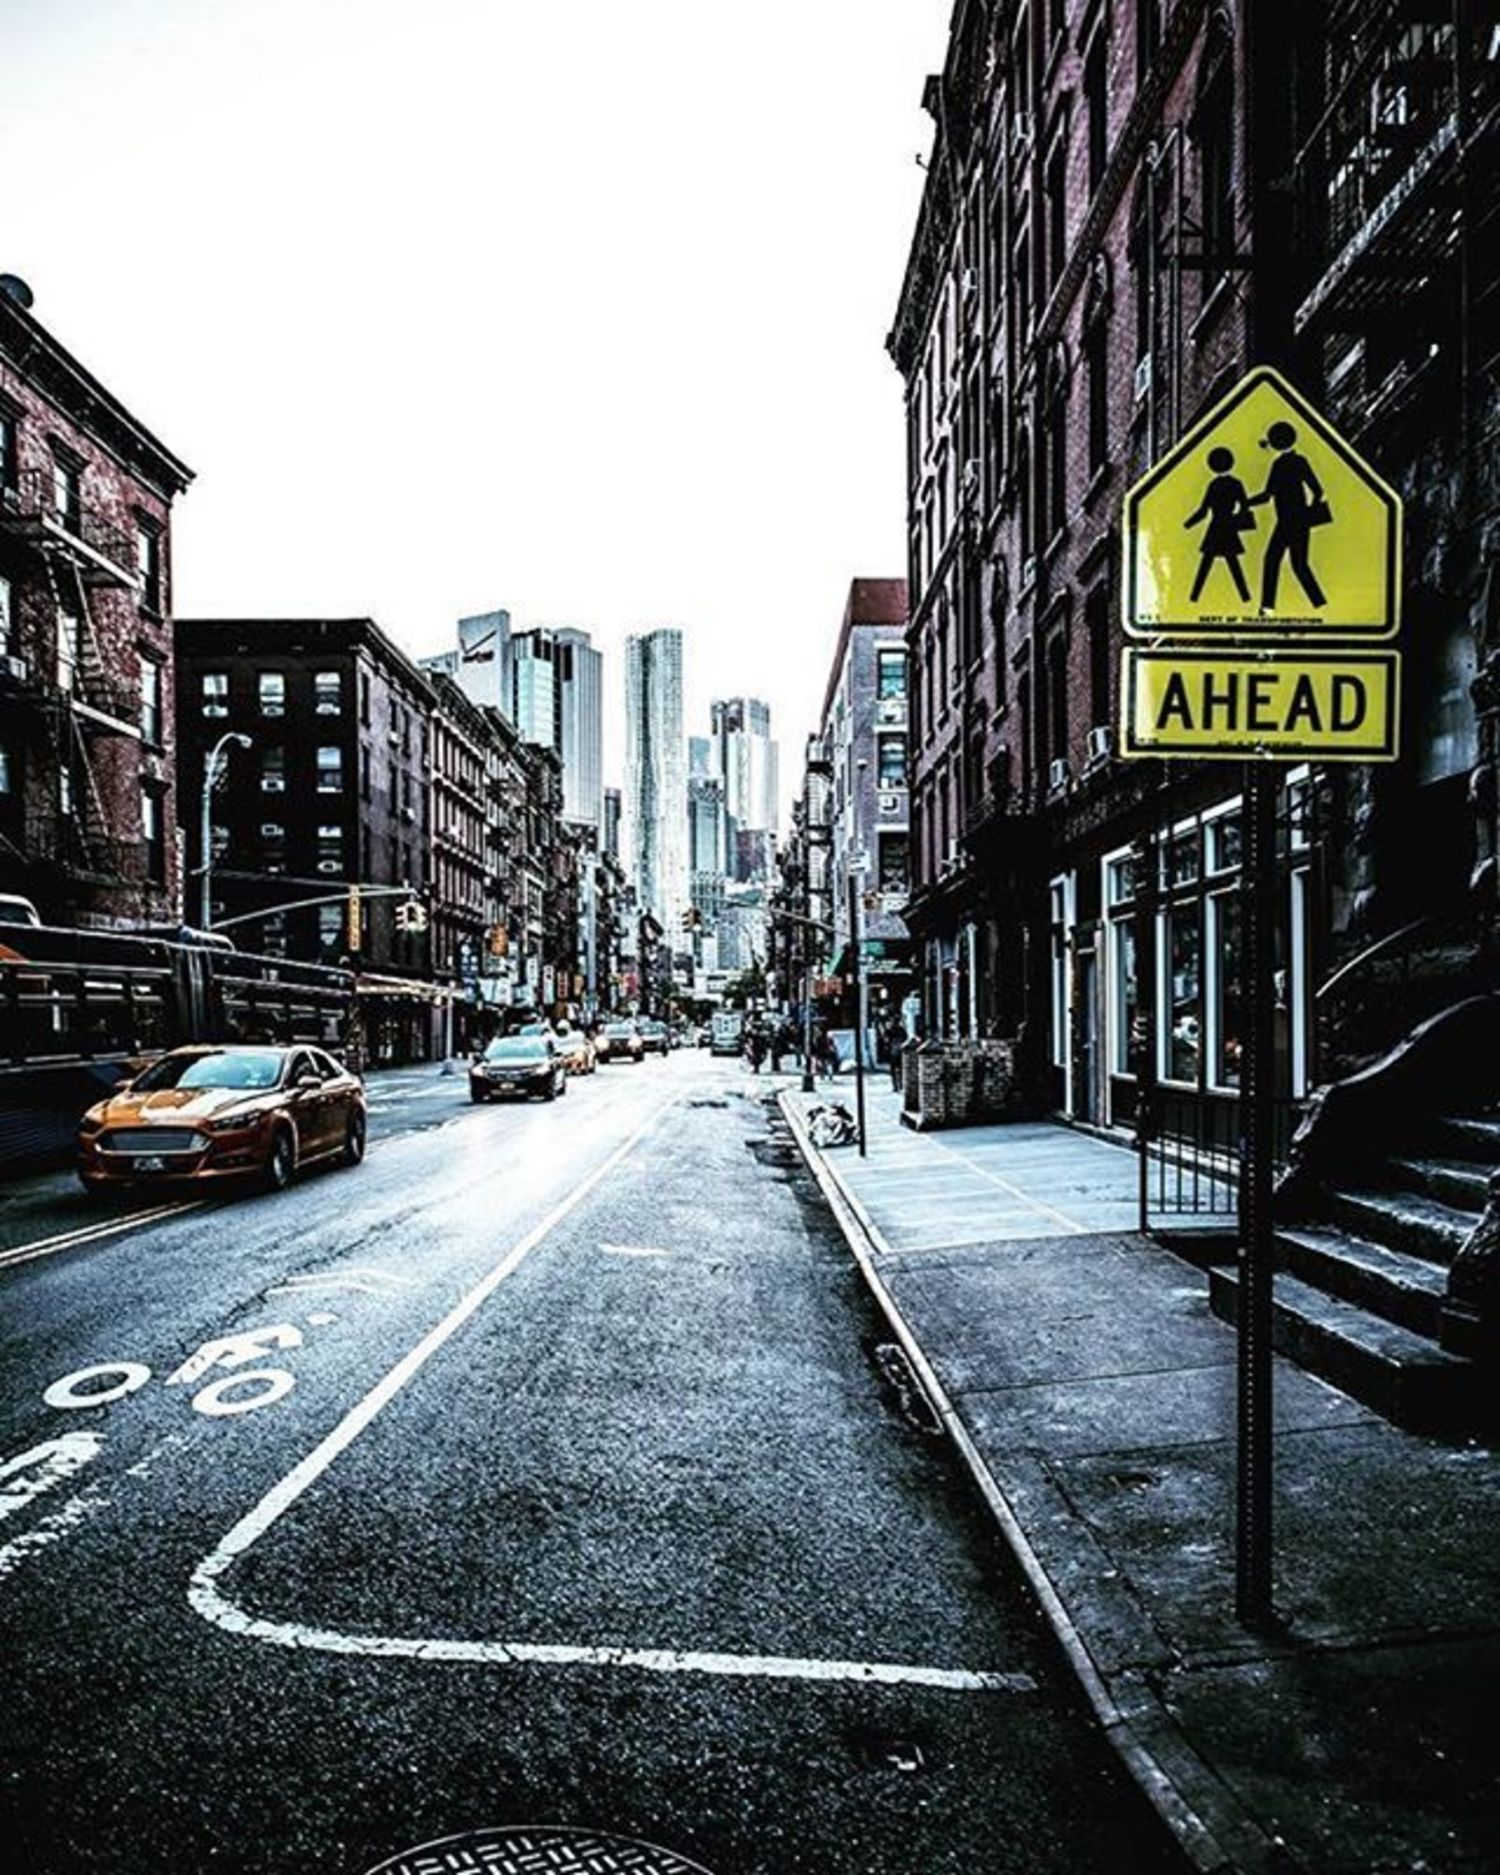 New York, New York. Photo via @m_bautista330 #viewingnyc #newyorkcity #newyork